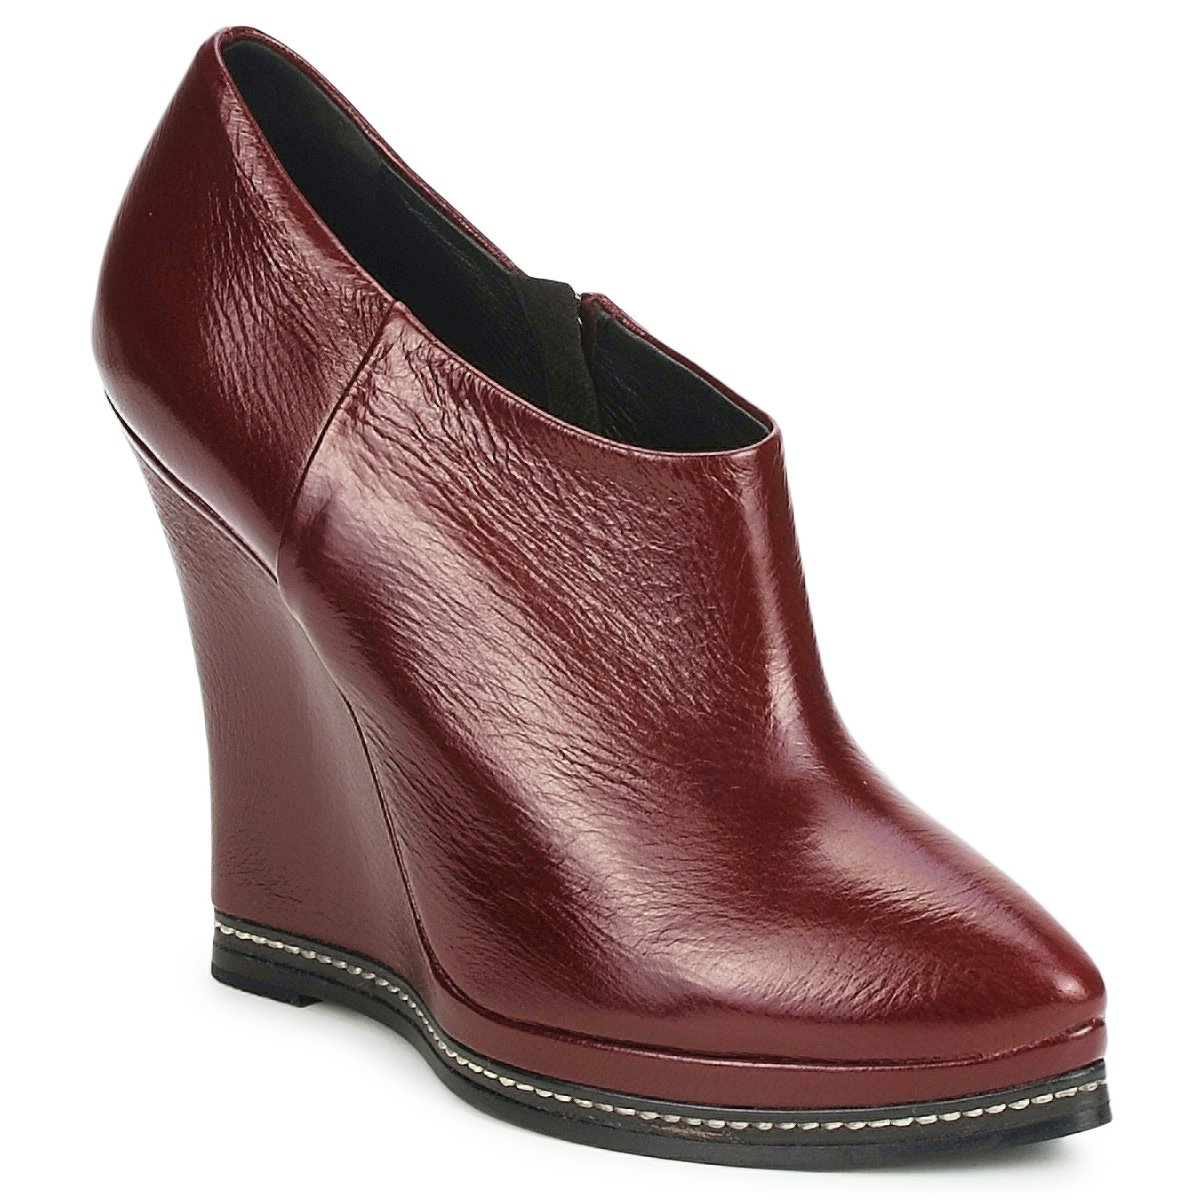 Fabi FD9627 Braun - Kostenloser Versand bei Spartoode ! - Schuhe Ankle Boots Damen 172,50 €